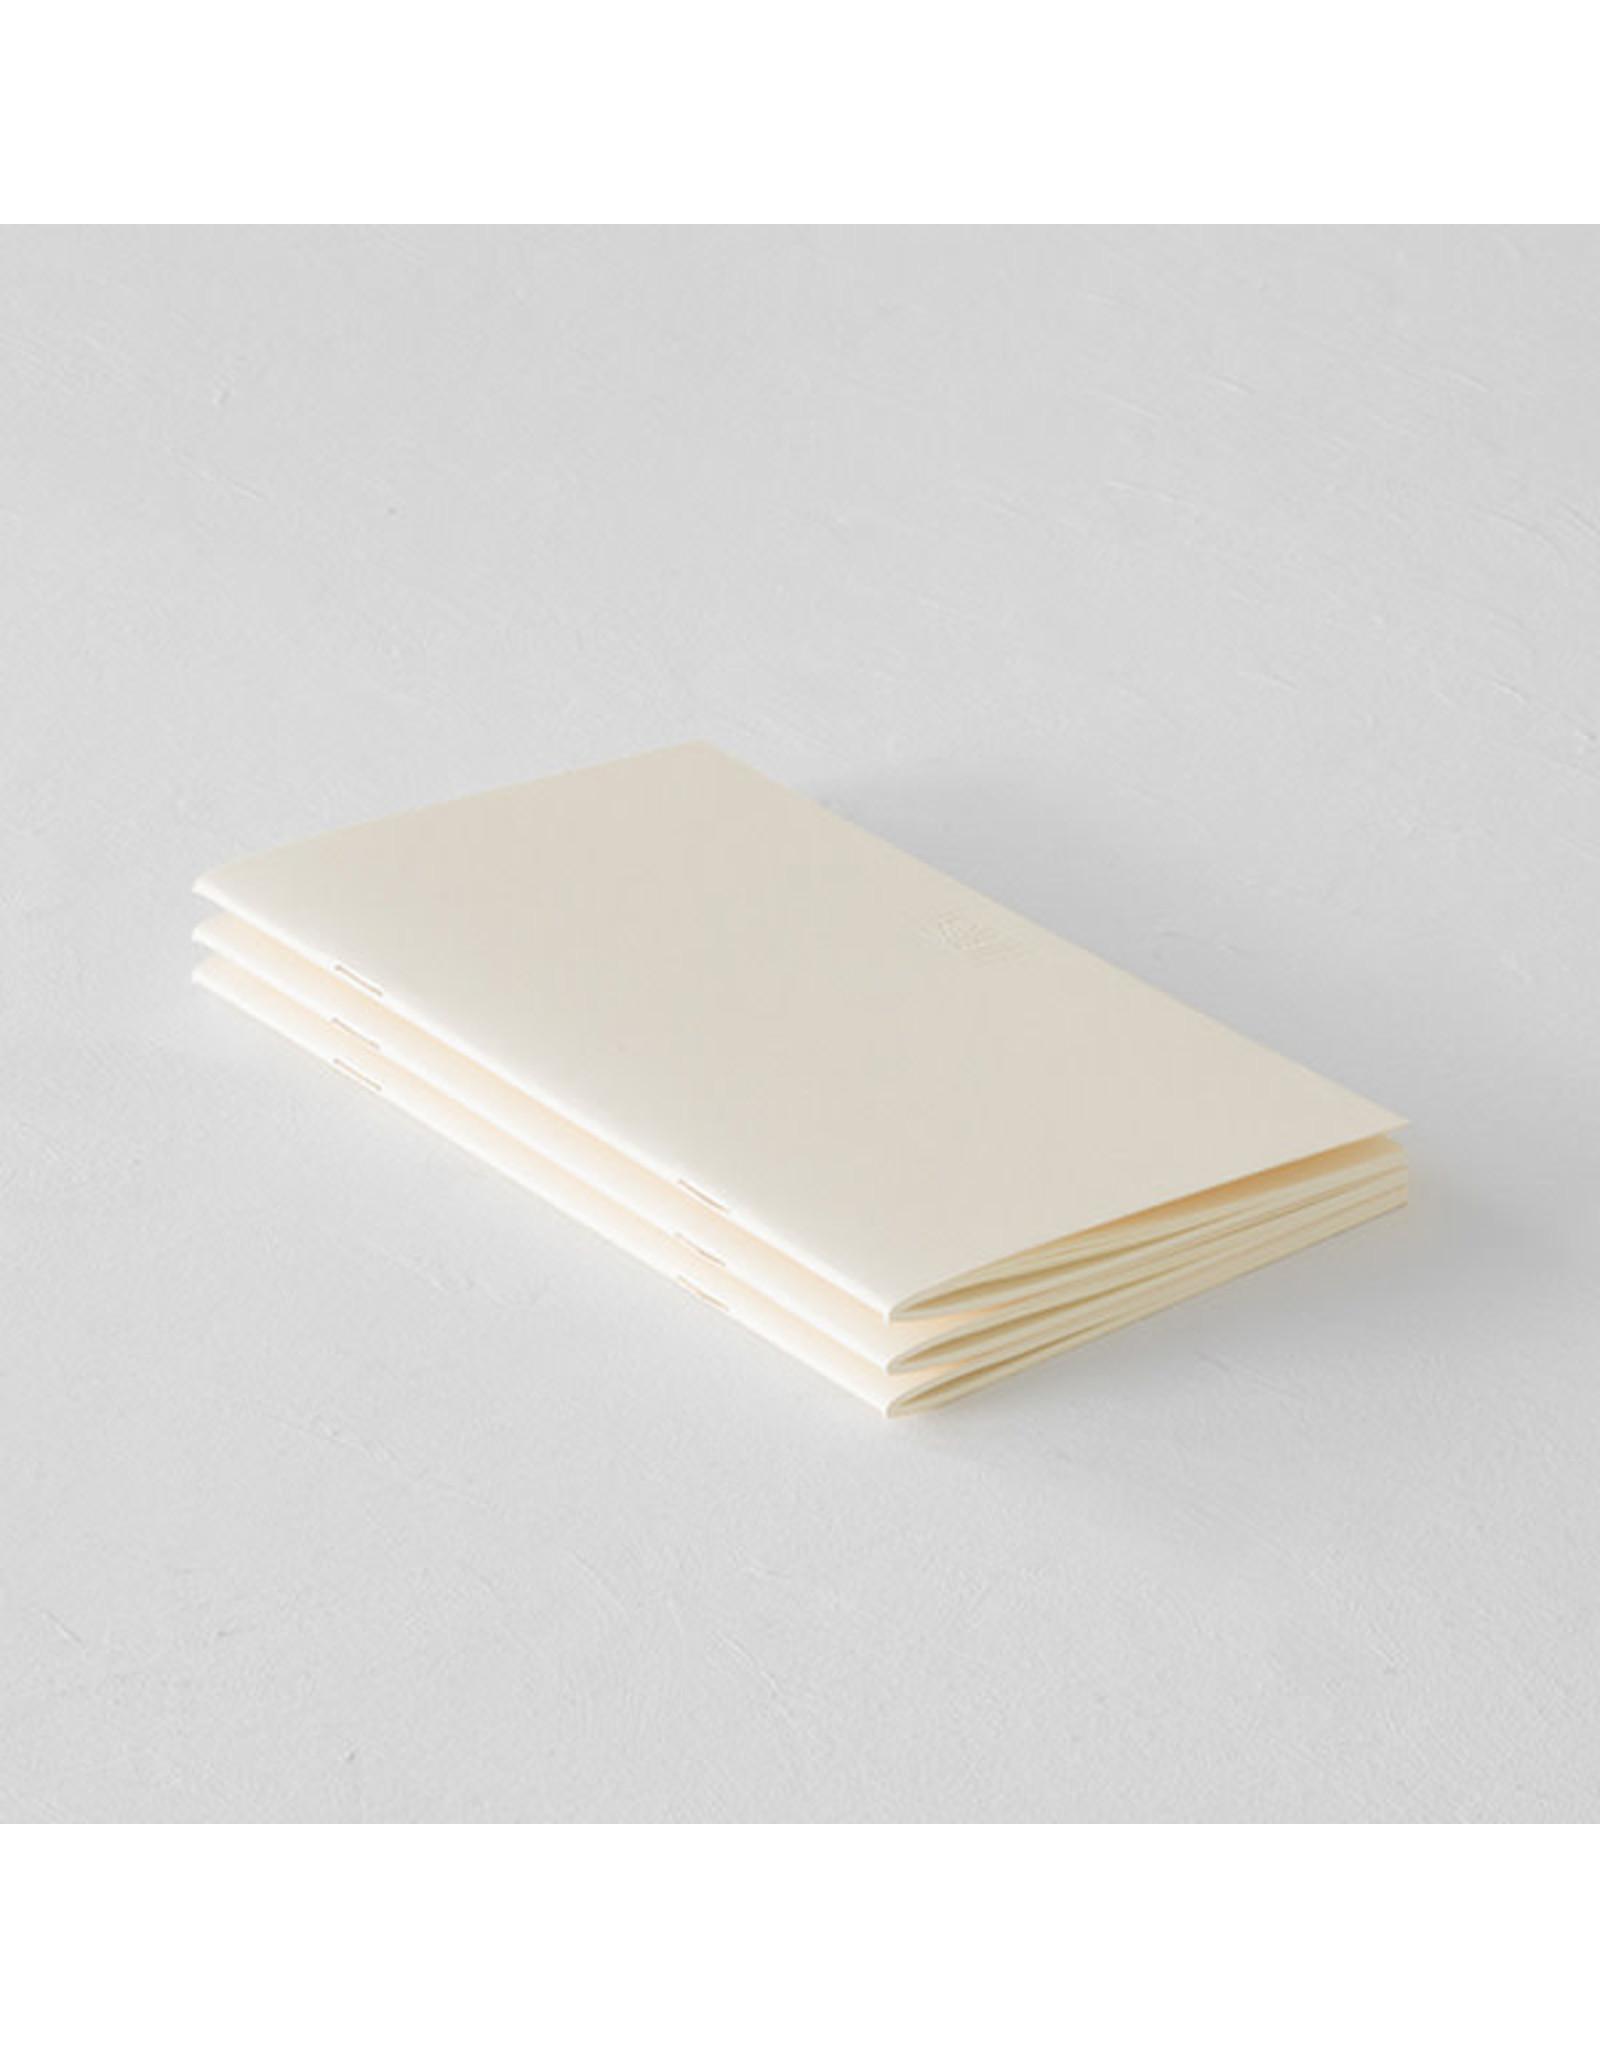 Designphil Inc. MD NOTEBOOK LIGHT  BLANK 3PCS PACK B6 SLIM